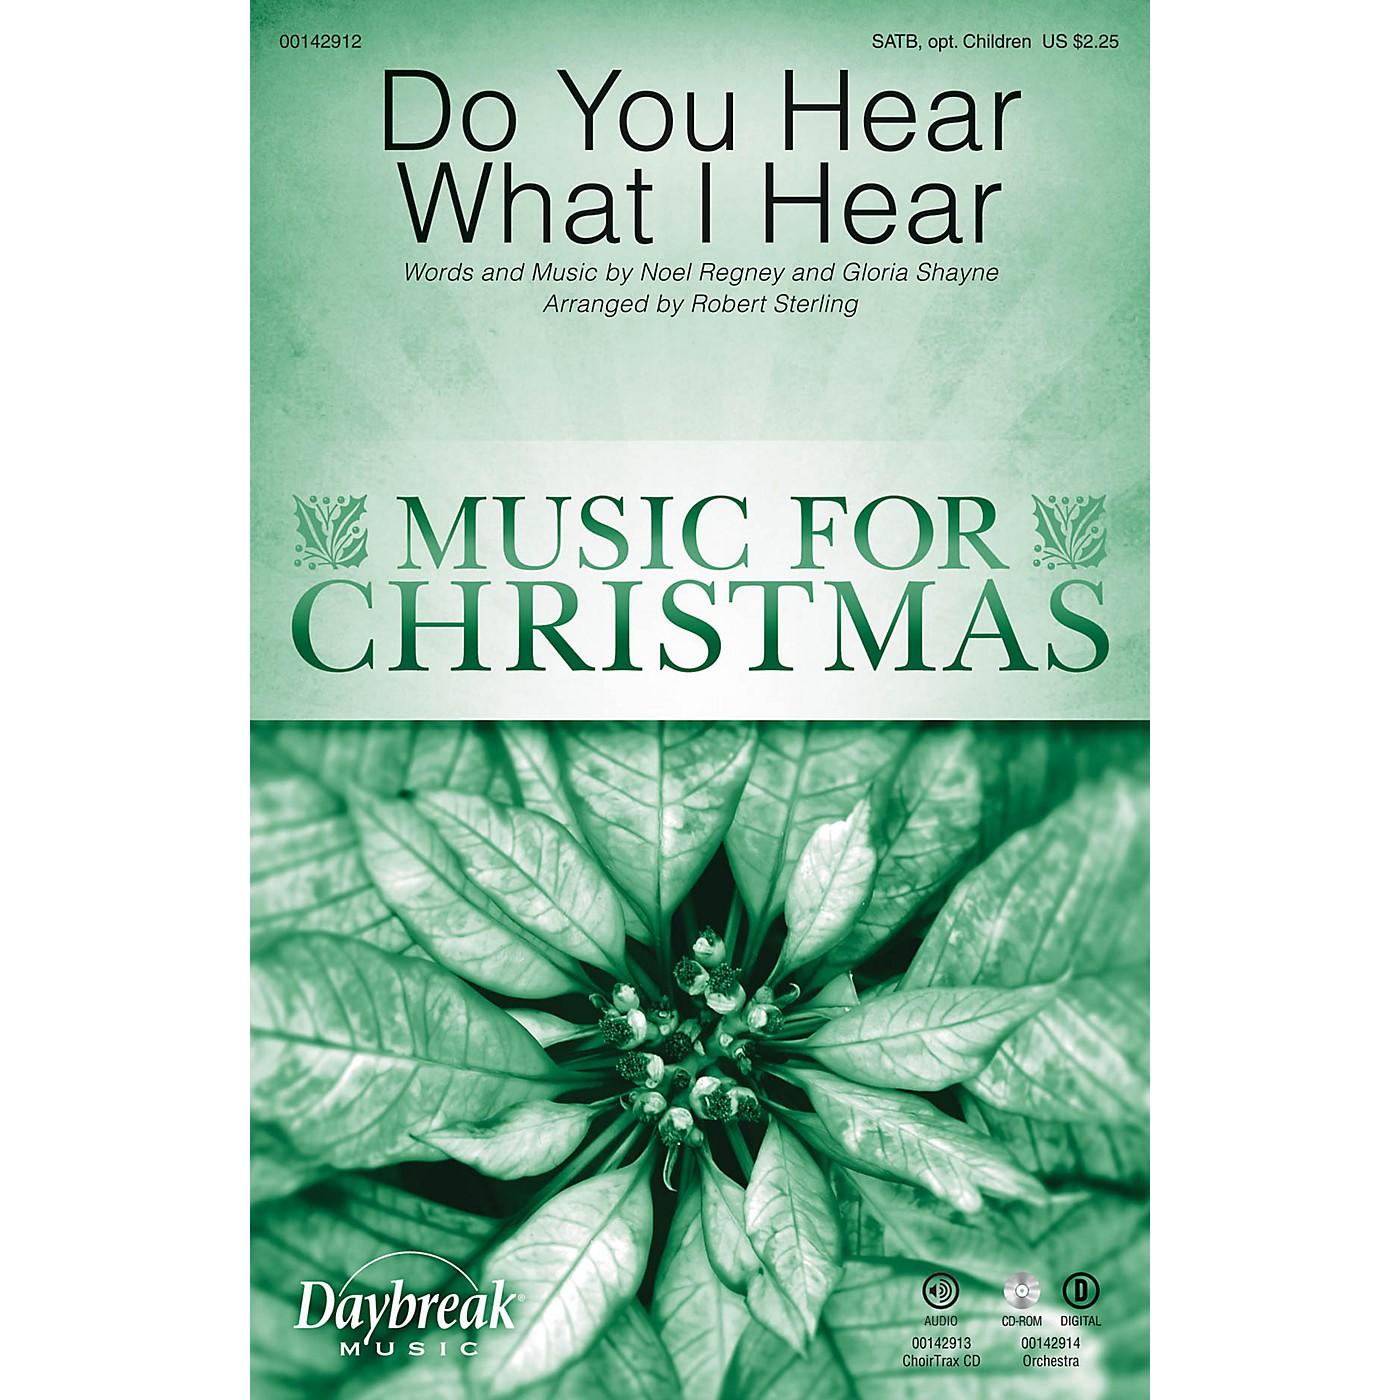 Daybreak Music Do You Hear What I Hear SATB/CHILDREN'S CHOIR arranged by Robert Sterling thumbnail